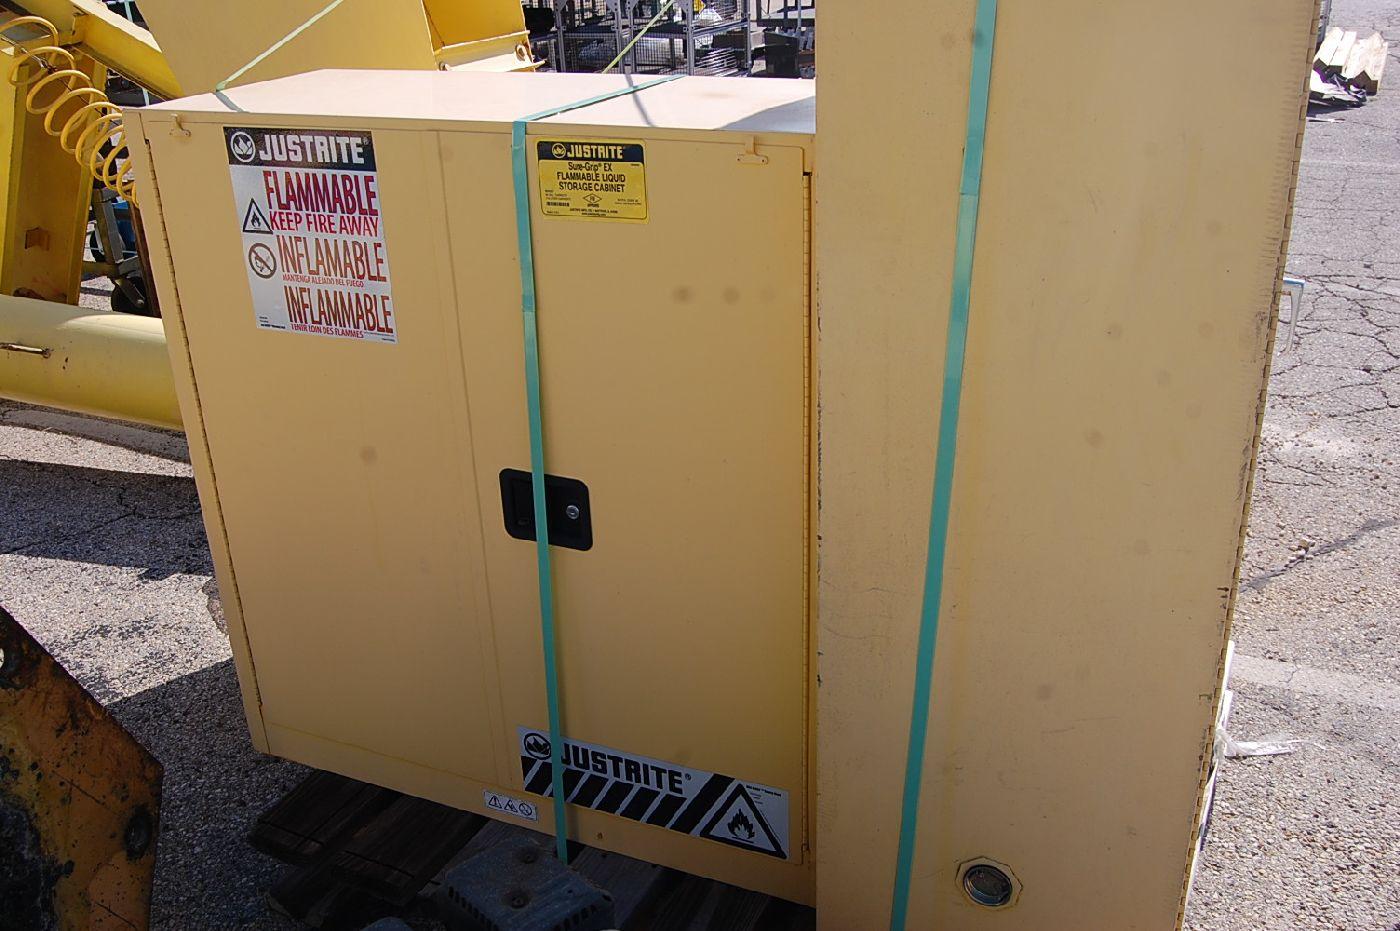 Justrite 45-Gallon Flammable Liquids Storage Cabinet - Image 3 of 3